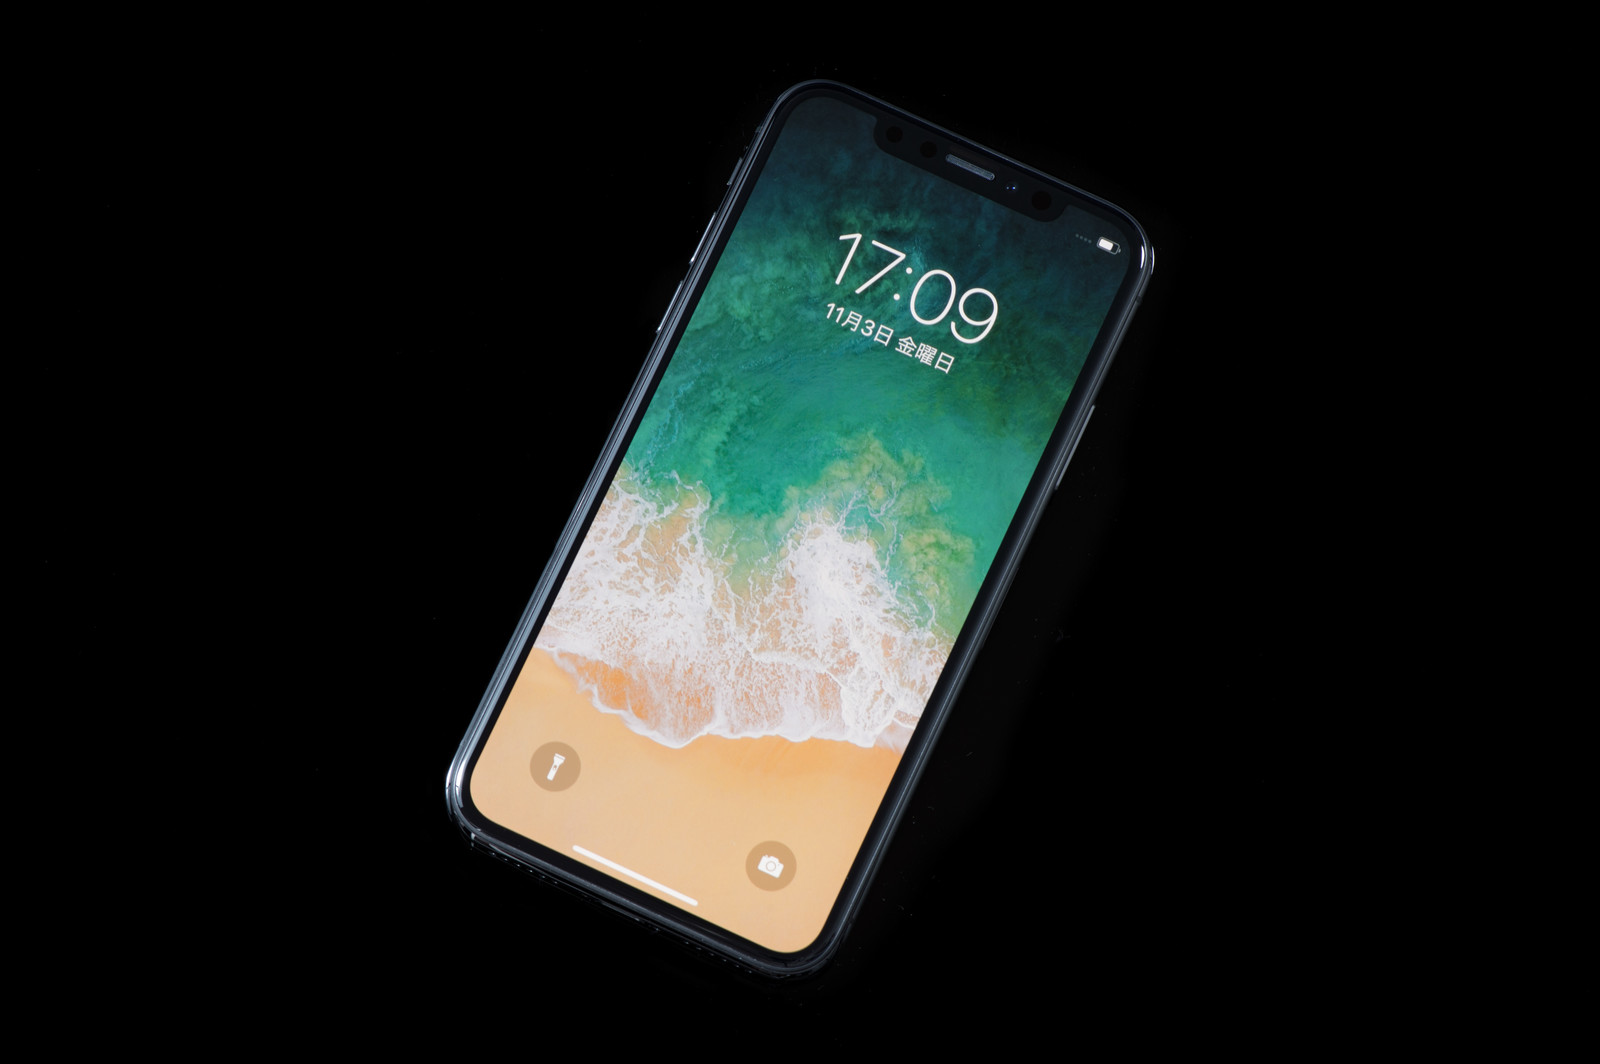 「iPhone X(アイフォーンテン・スペースグレイ)」の写真